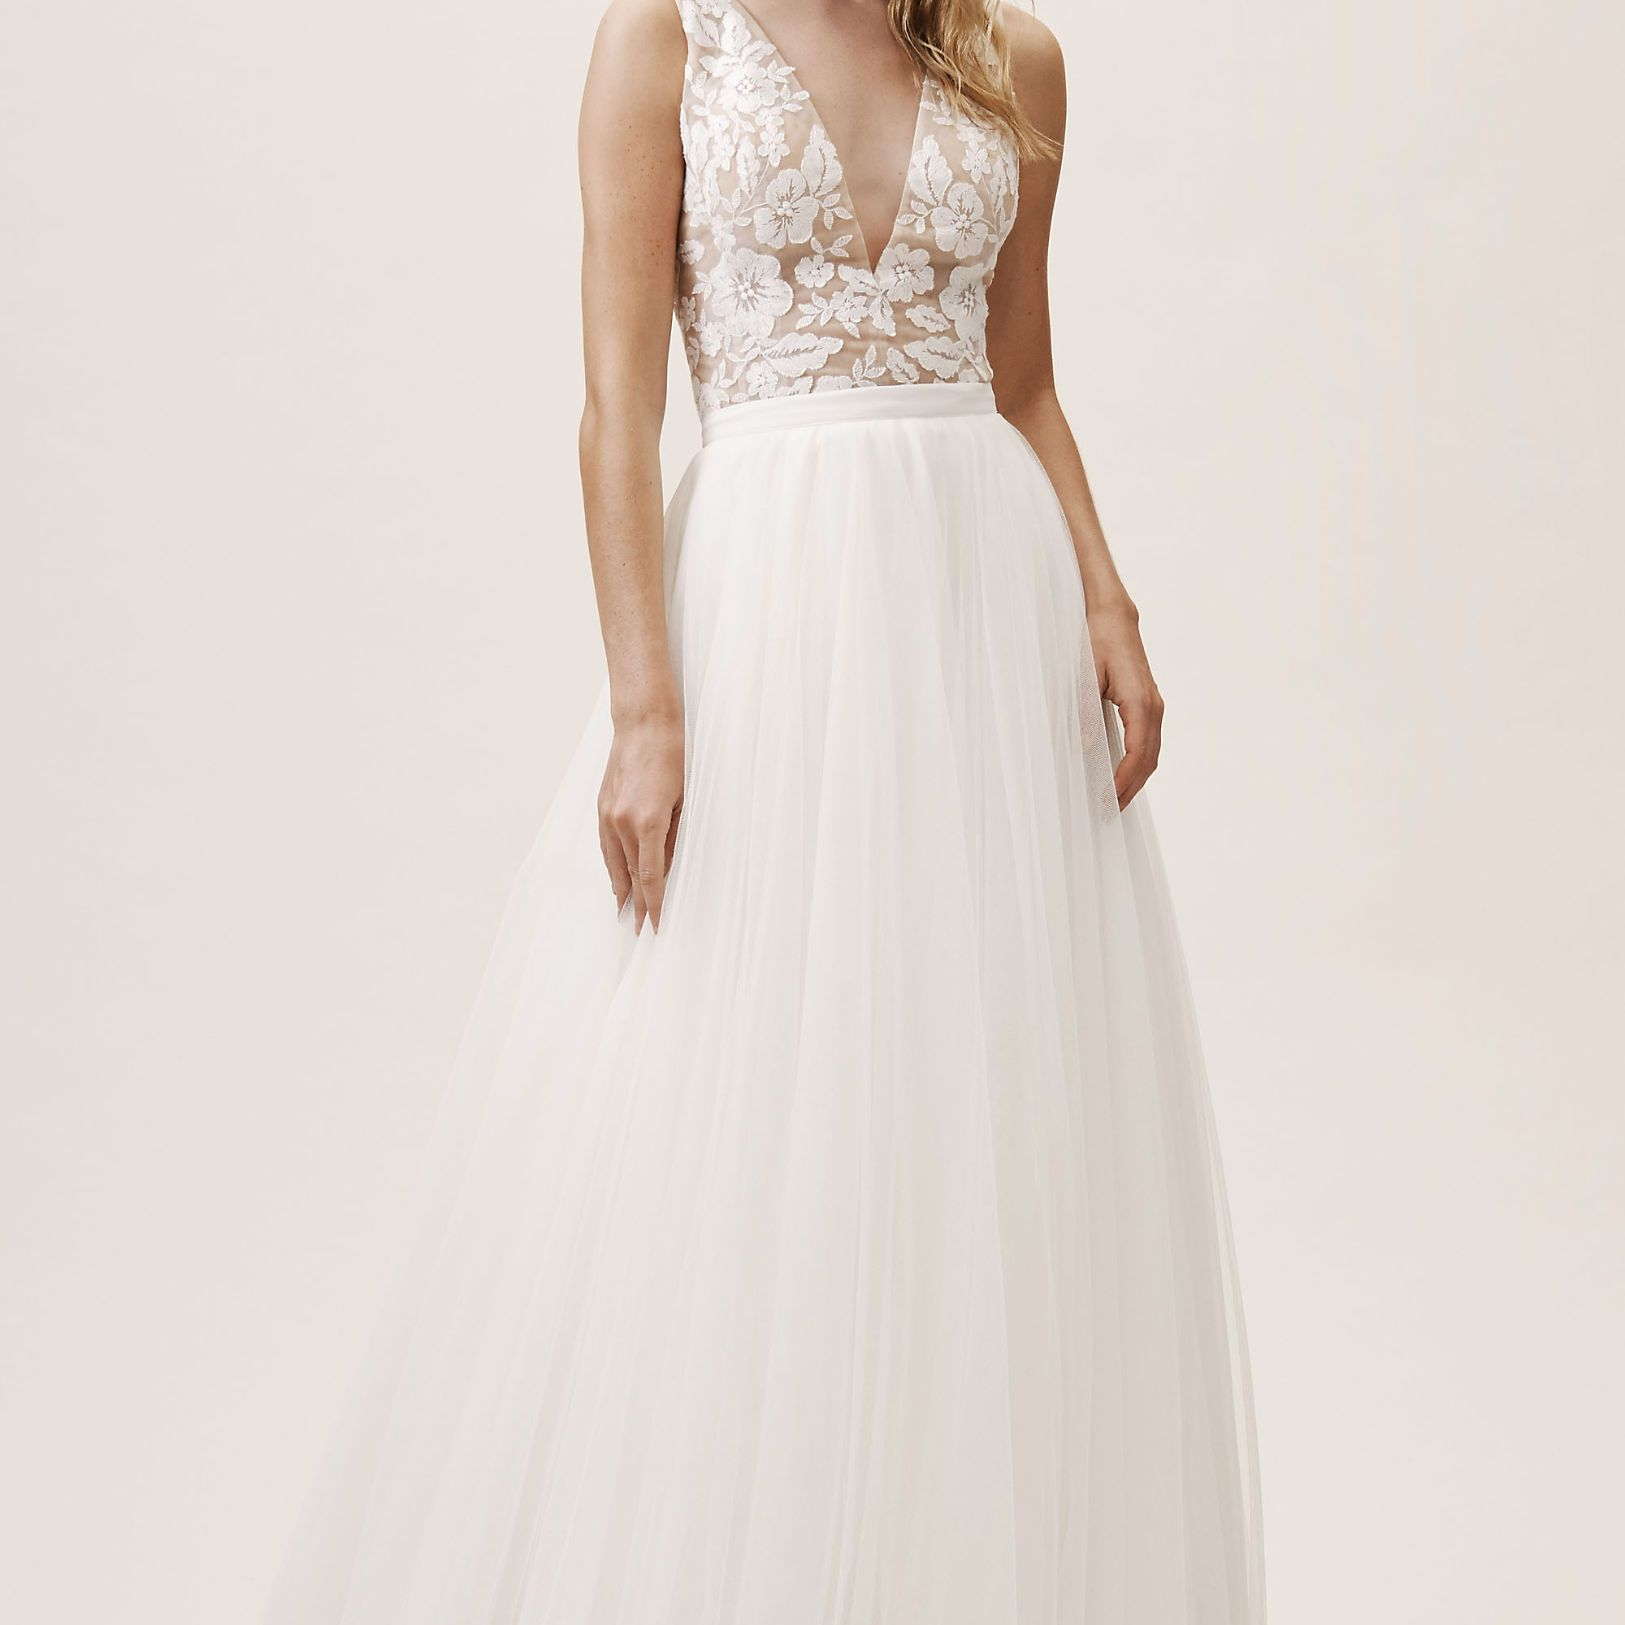 b7feaf5f509 19 Bridal Separates Sets for a Modern Bridal Moment